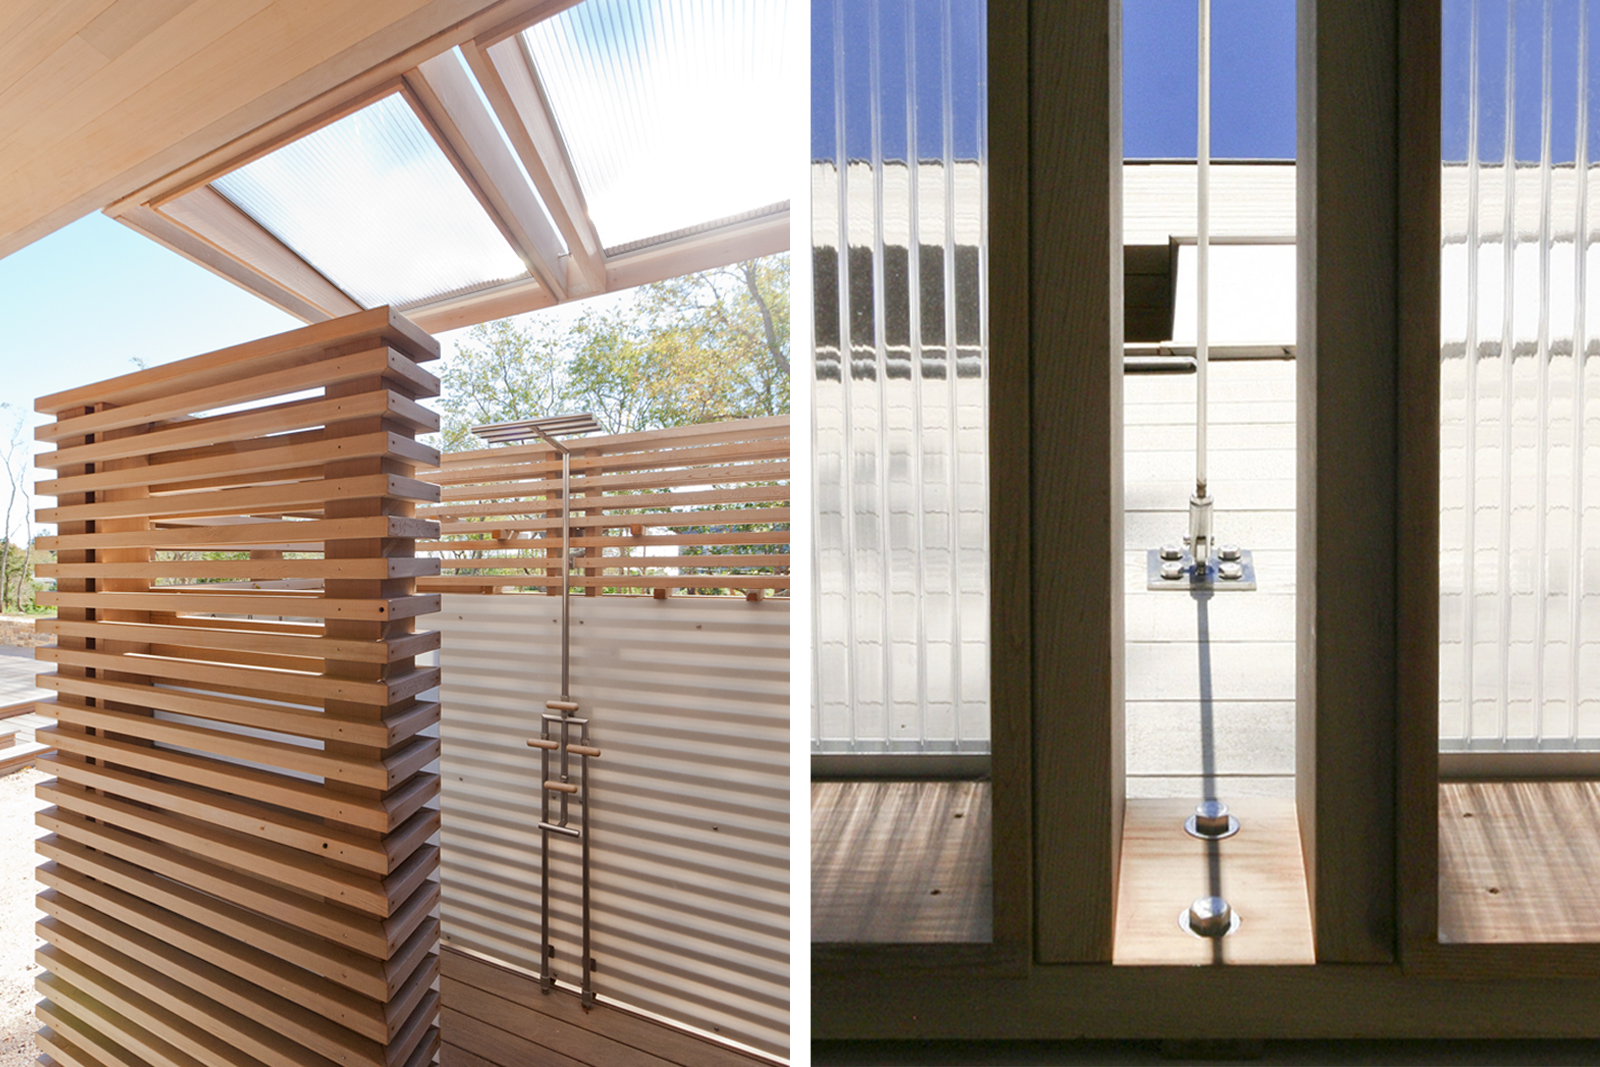 21-res4-resolution-4-architecture-modern-modular-home-prefab-house-fishers-island-exterior-outdoor-shower.jpg